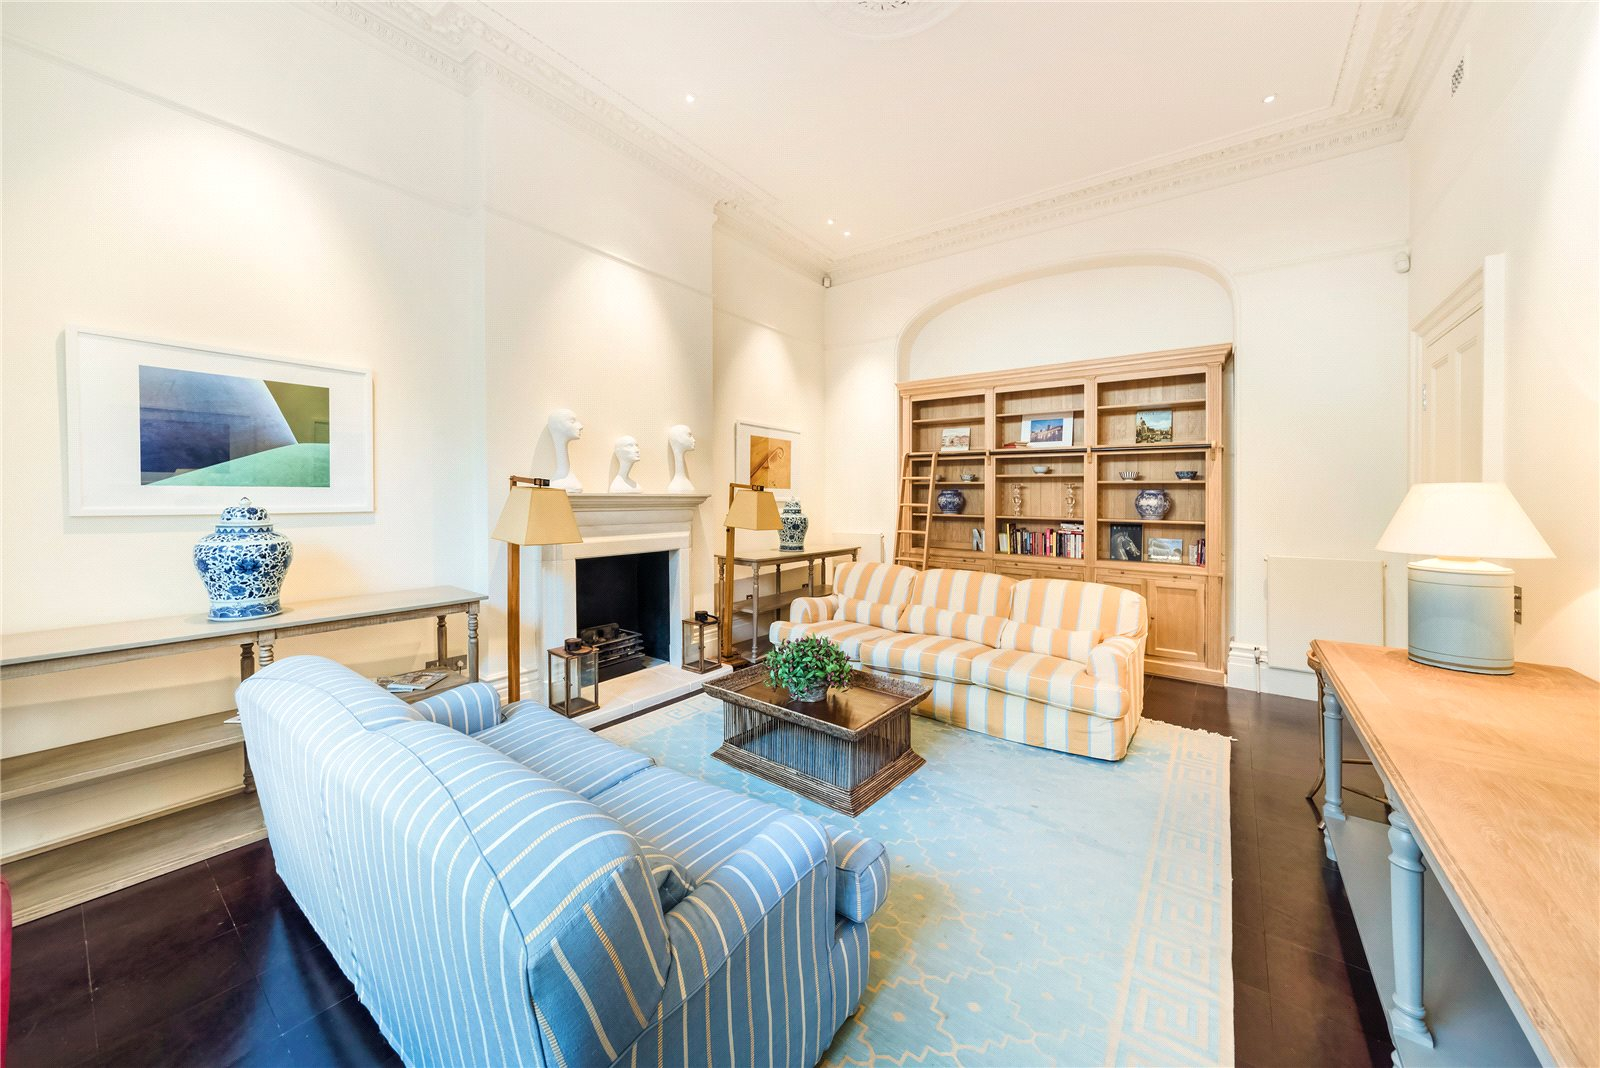 Apartments / Residences for Sale at Roland Gardens, South Kensington, SW7 South Kensington, England